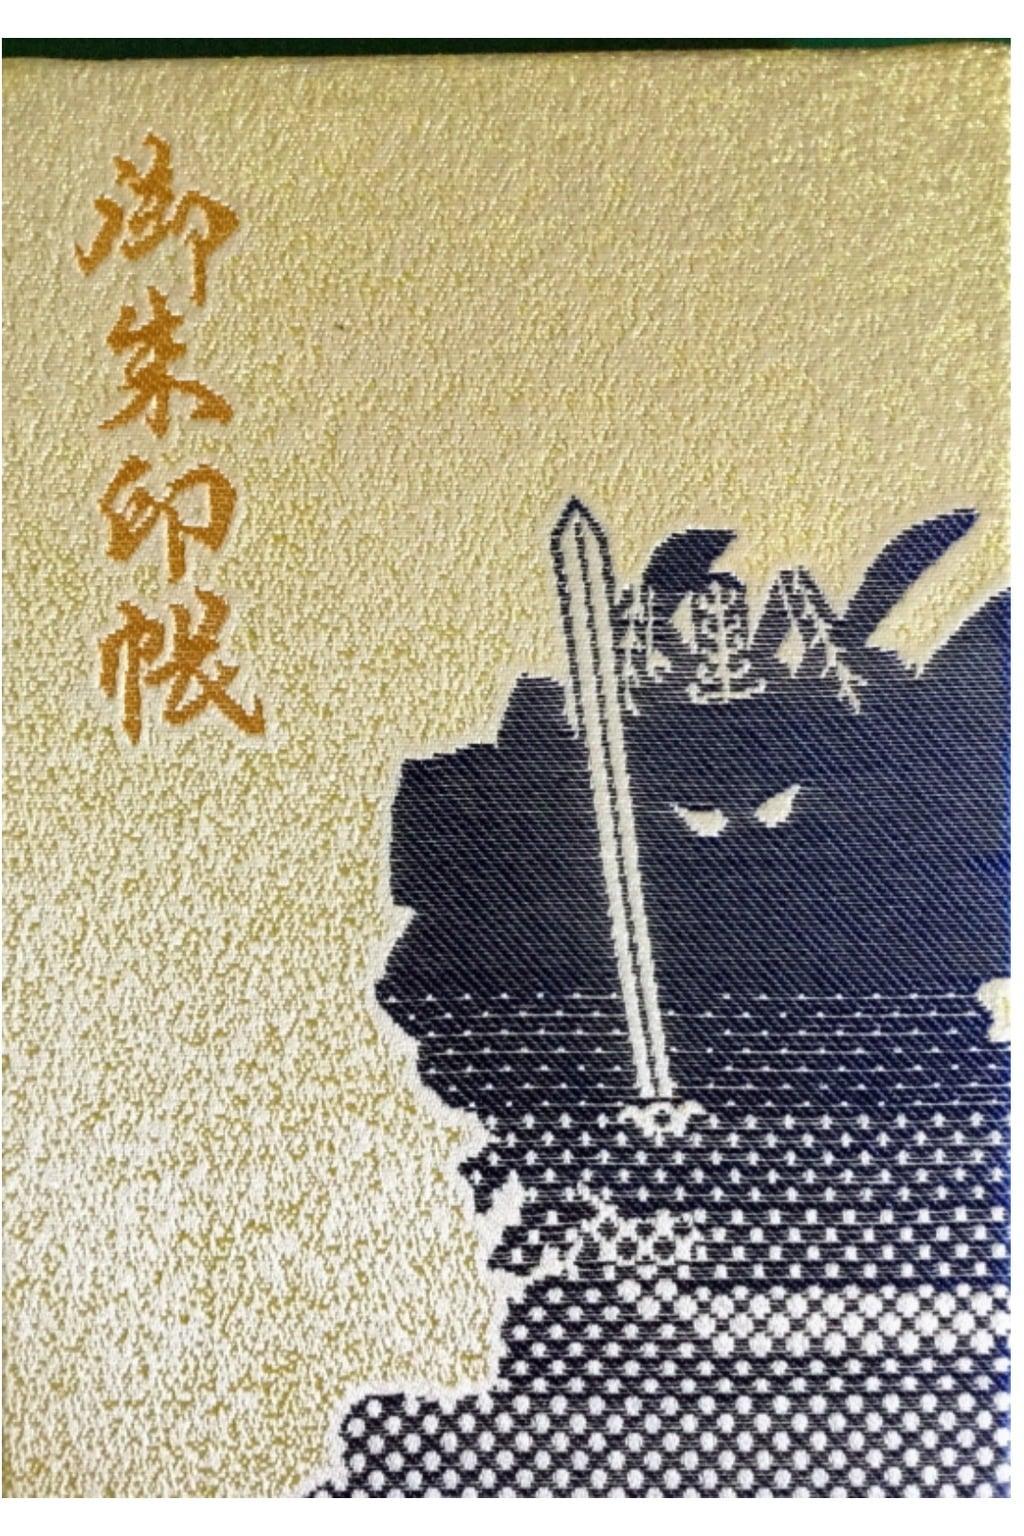 鎮守氷川神社の御朱印帳